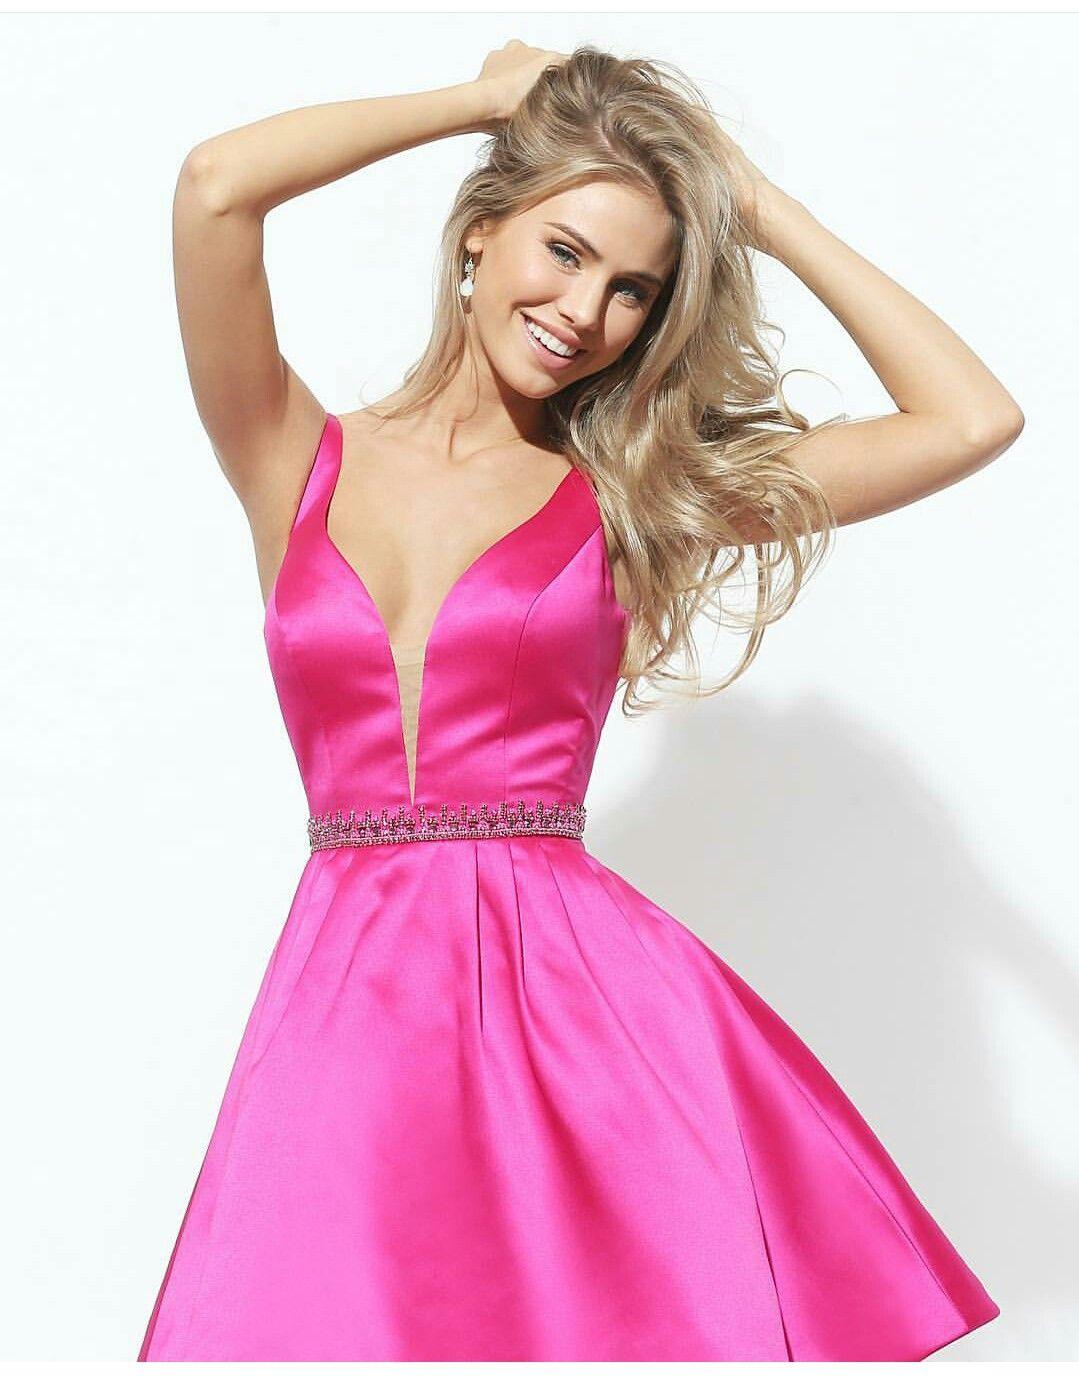 Paola Glam Style | Paola Glam Style | Pinterest